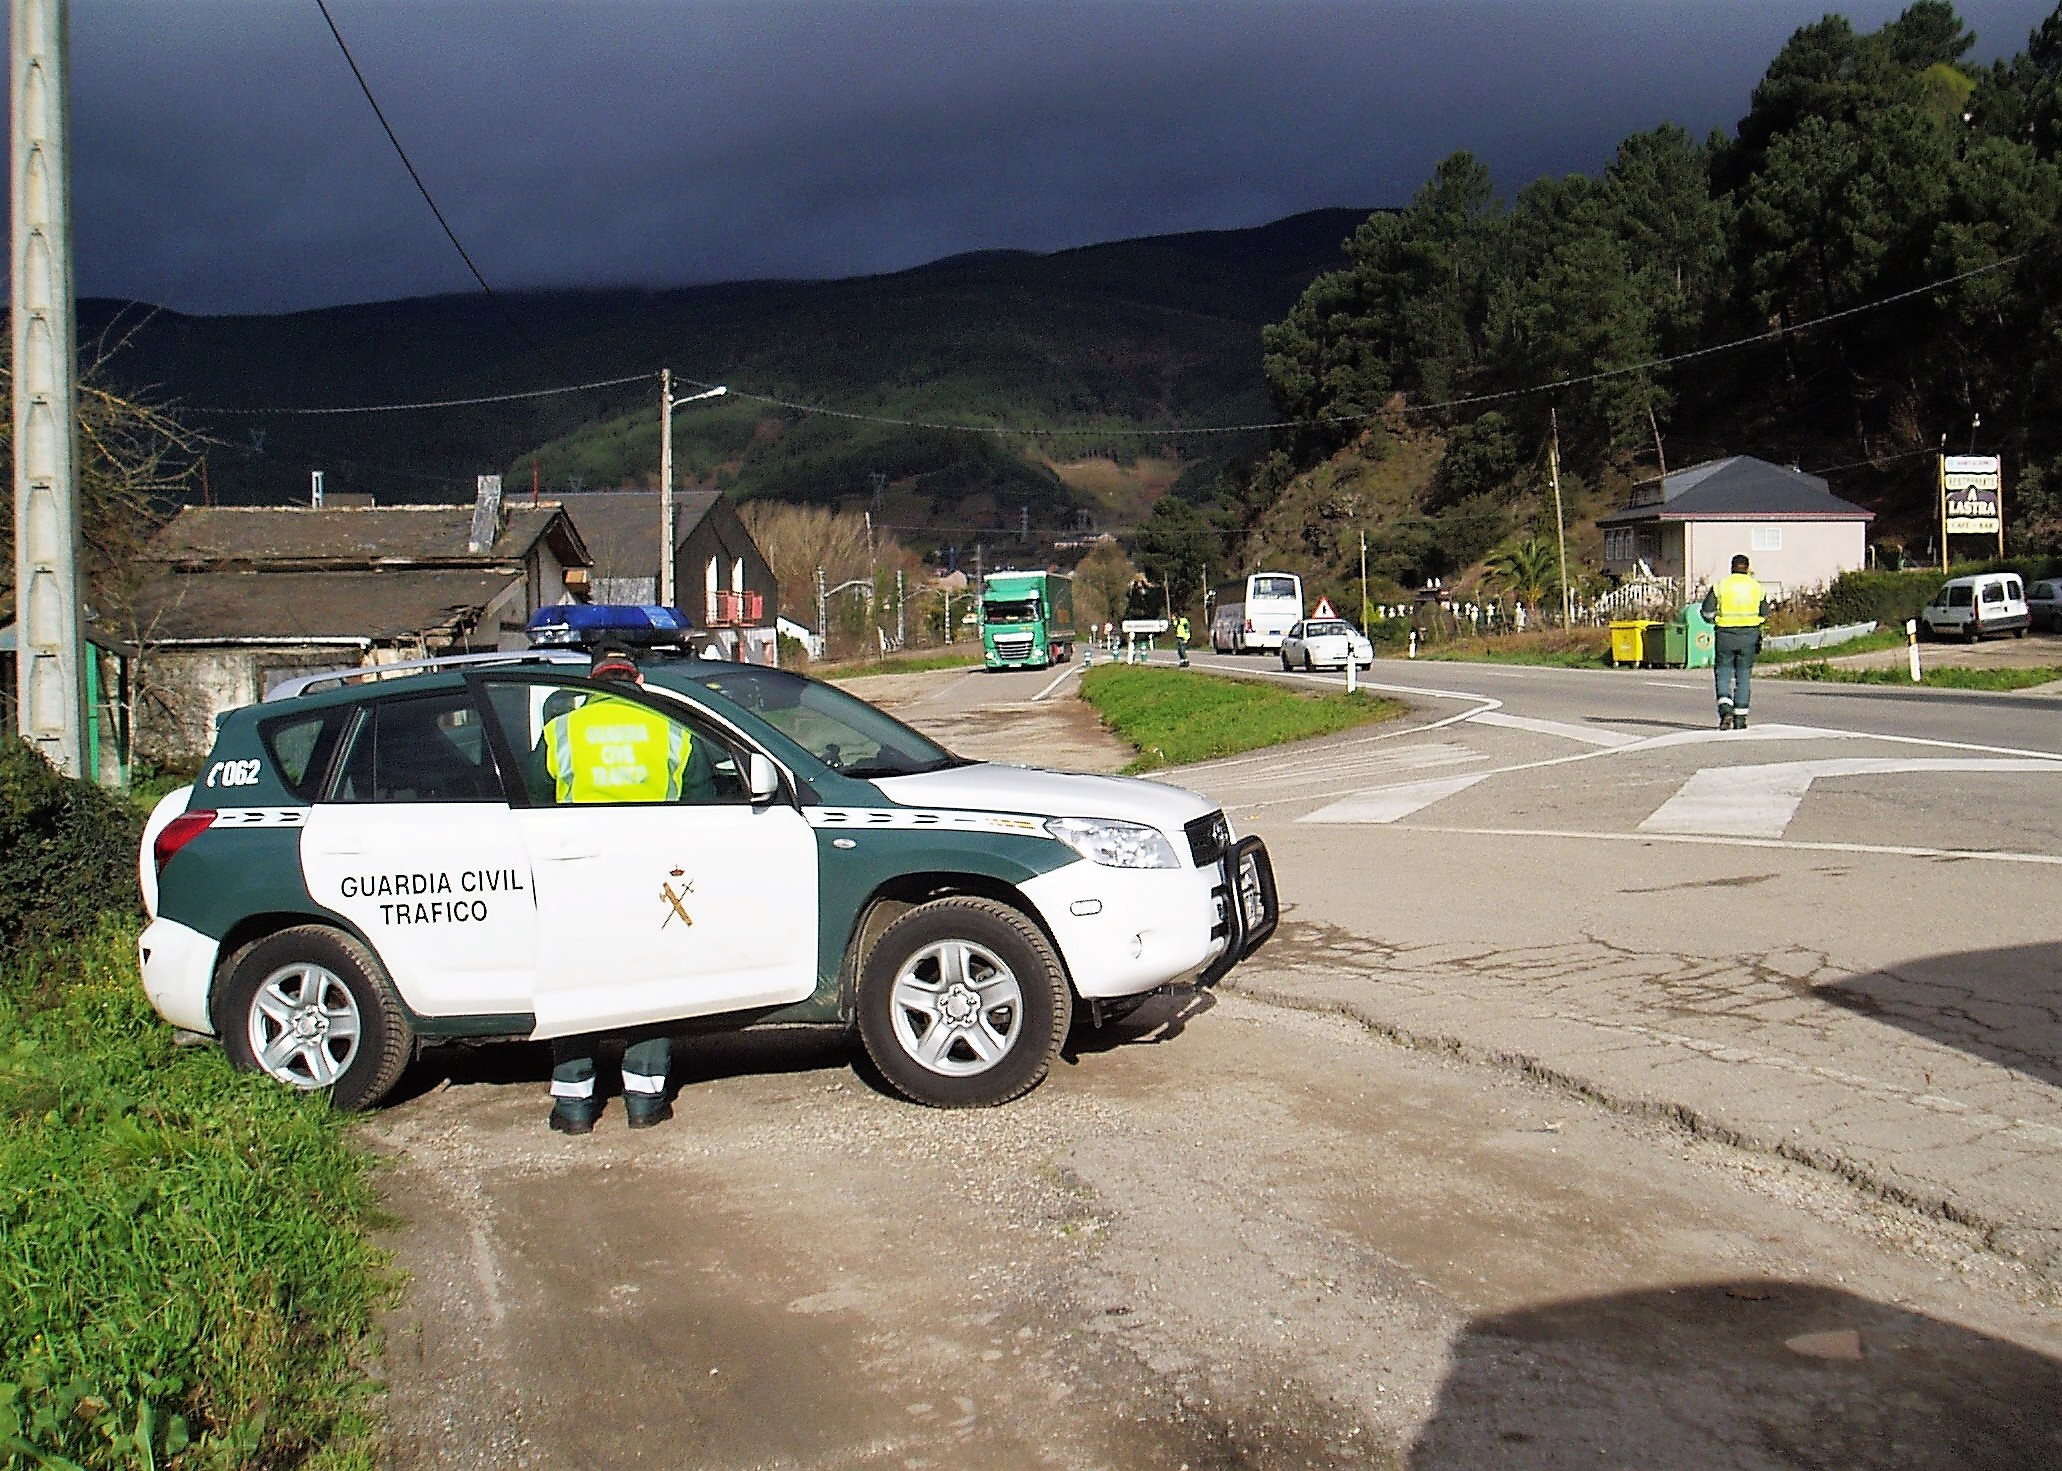 Guarda Civil de Tráfico